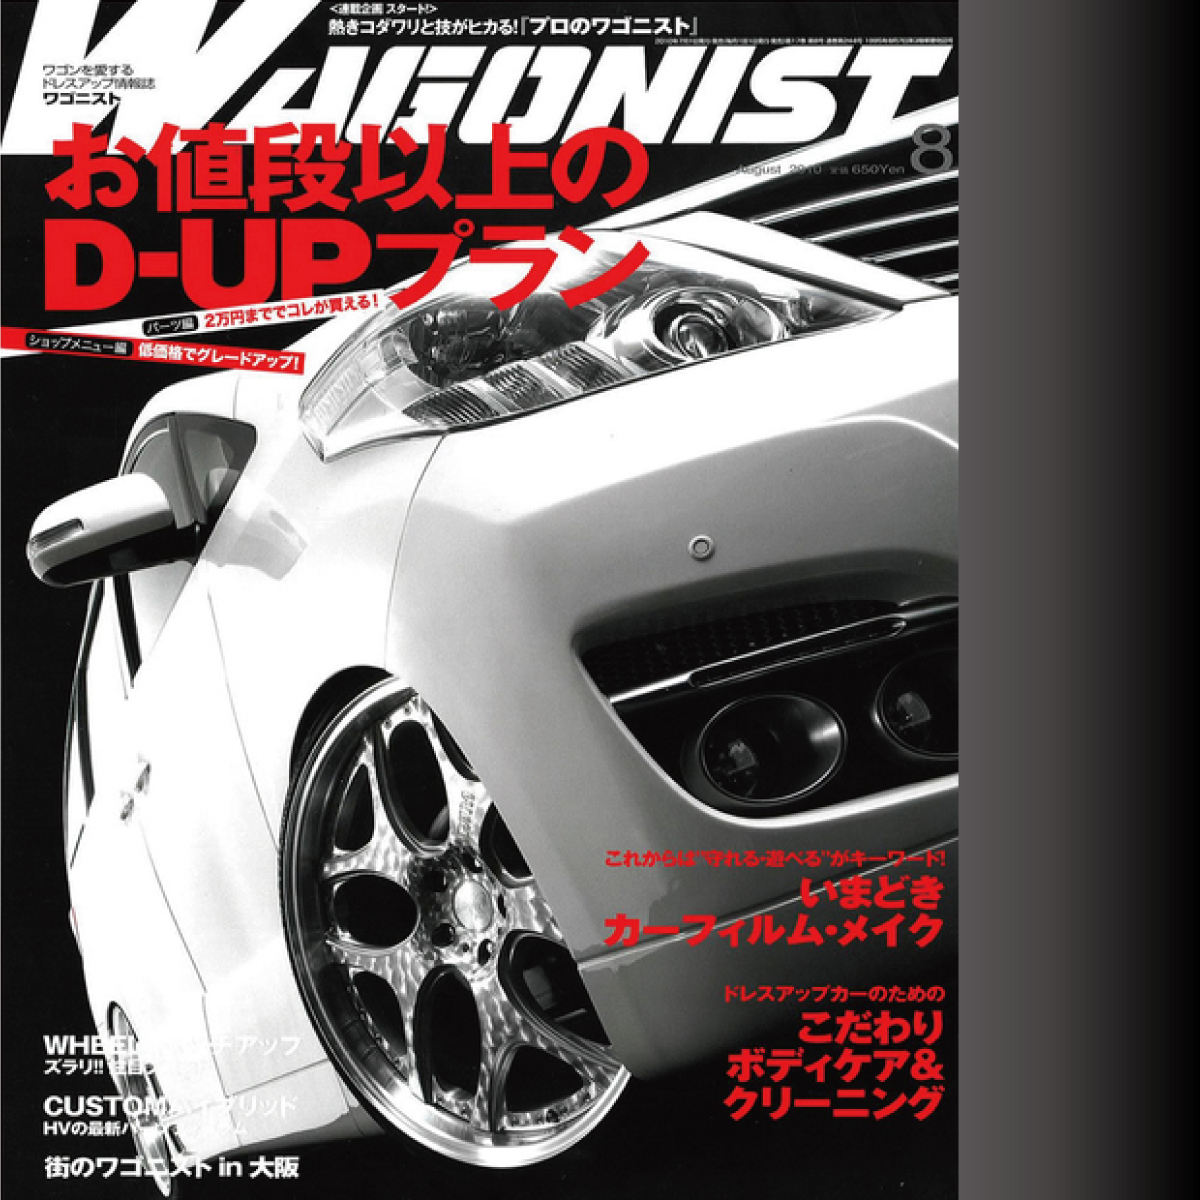 CLEFS毛ばたき + WAGONIST(ワゴニスト) 2010年8月号